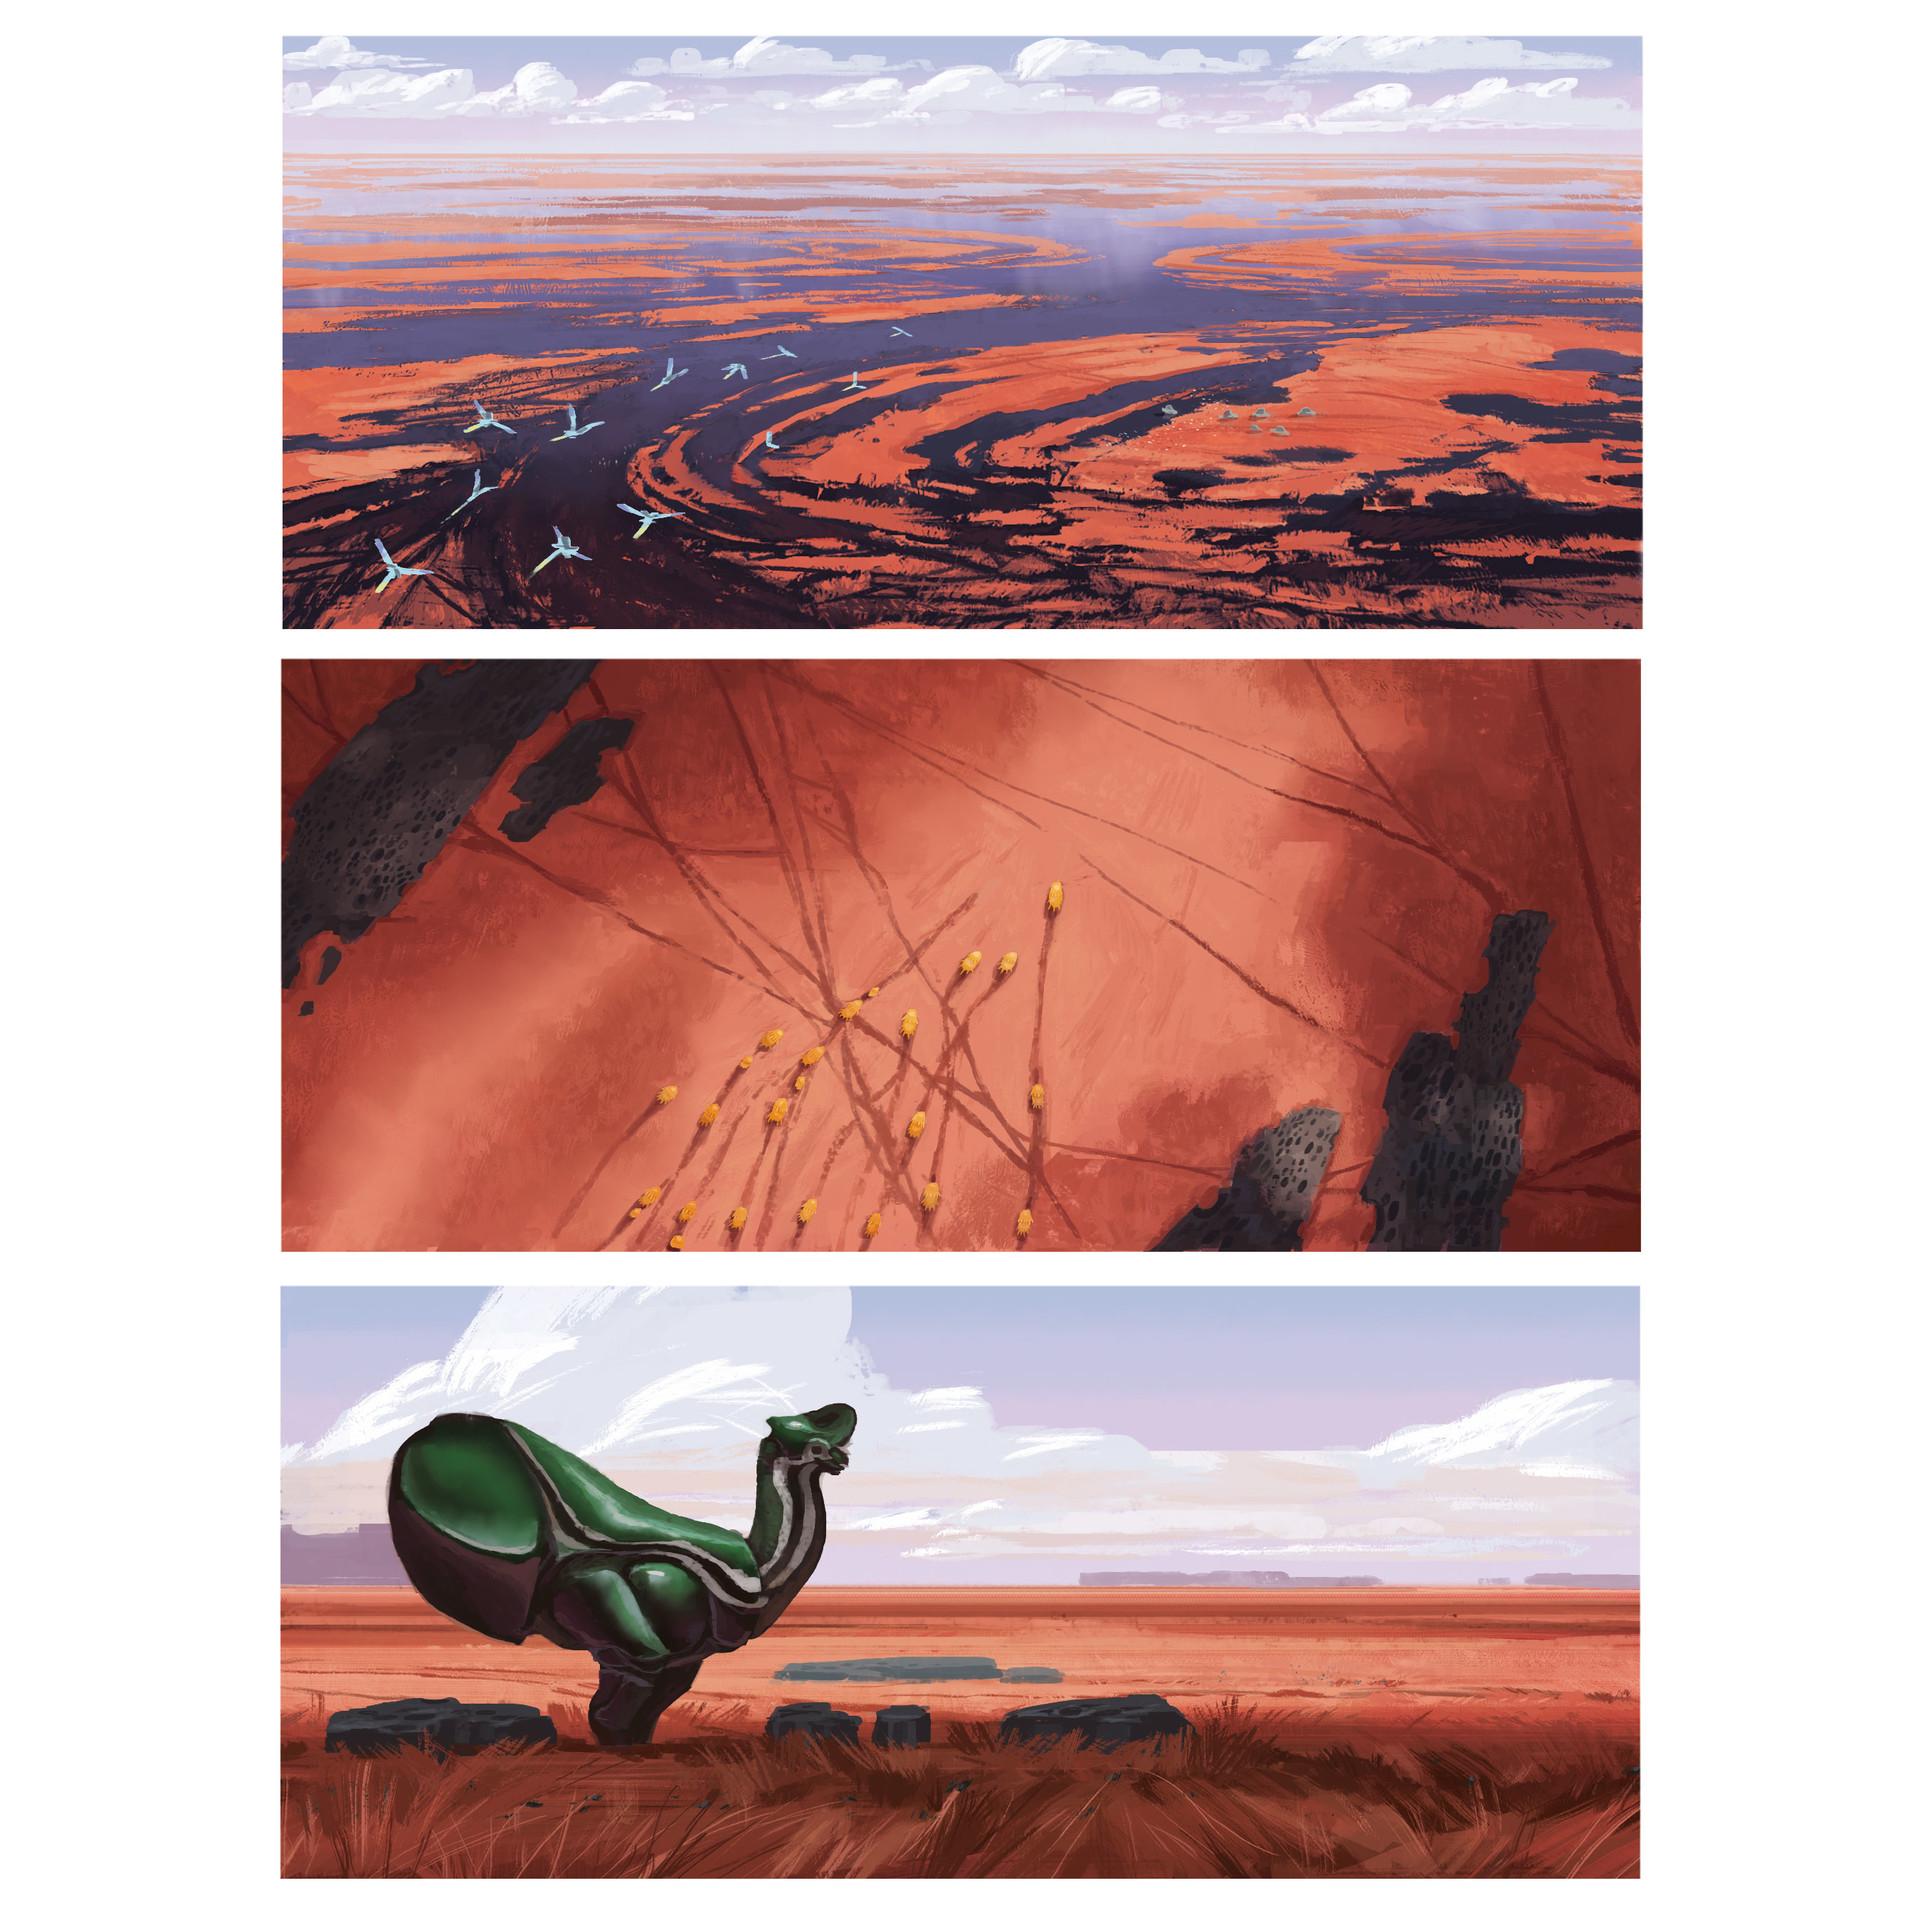 [Reflexion] Les oeuvres qui vous inspirent Alexander-ostrowski-05-grassland-colorroughs-insta2